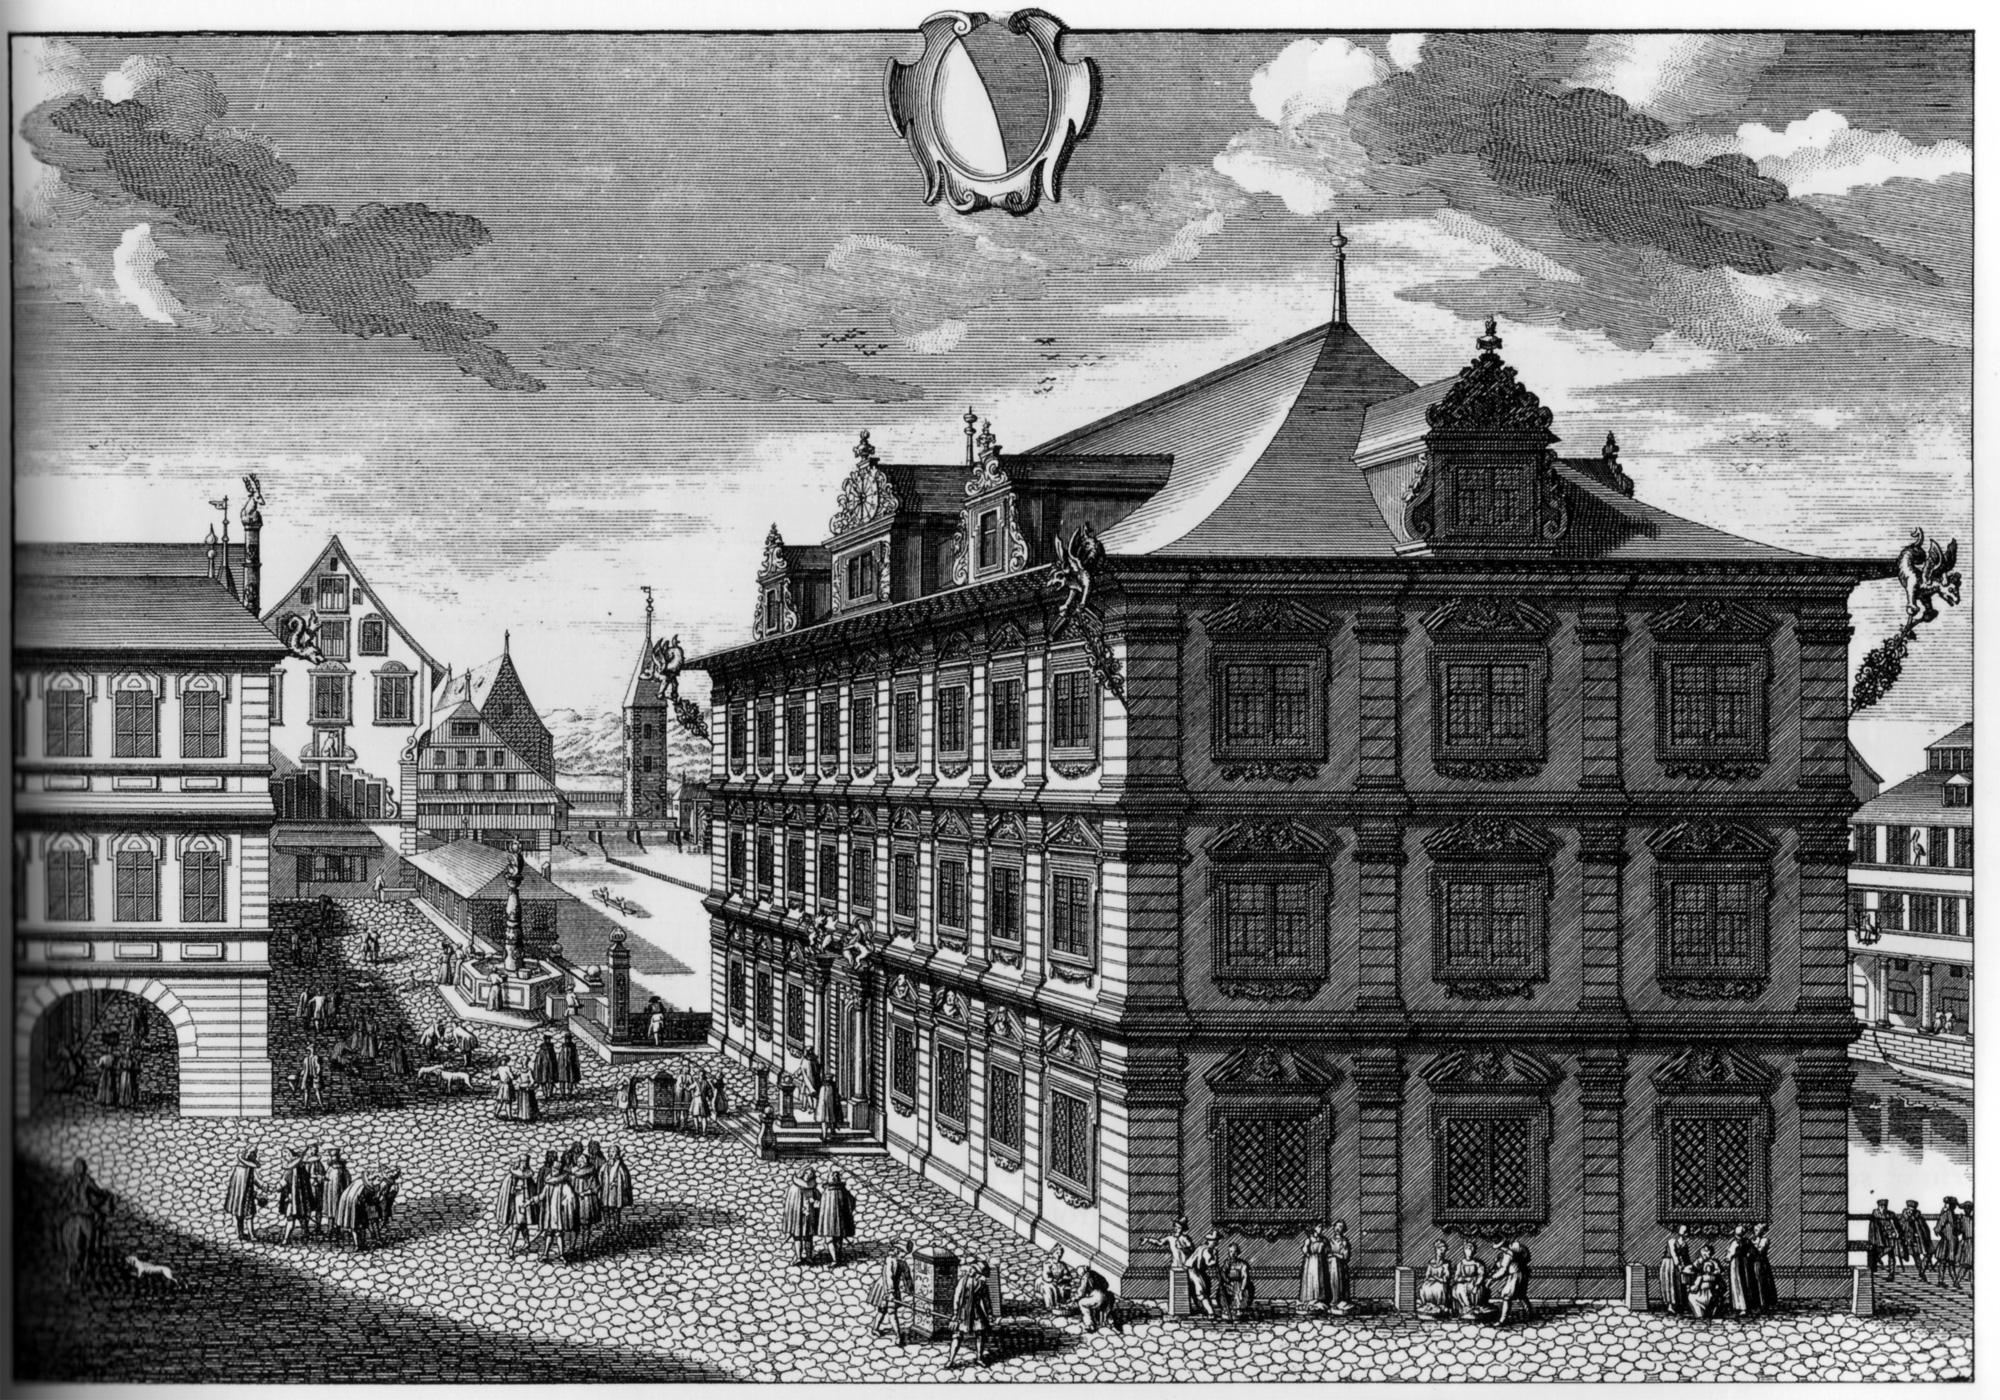 http://upload.wikimedia.org/wikipedia/commons/archive/c/c1/20091020100304!Rathaus_Zuerich1780.jpg